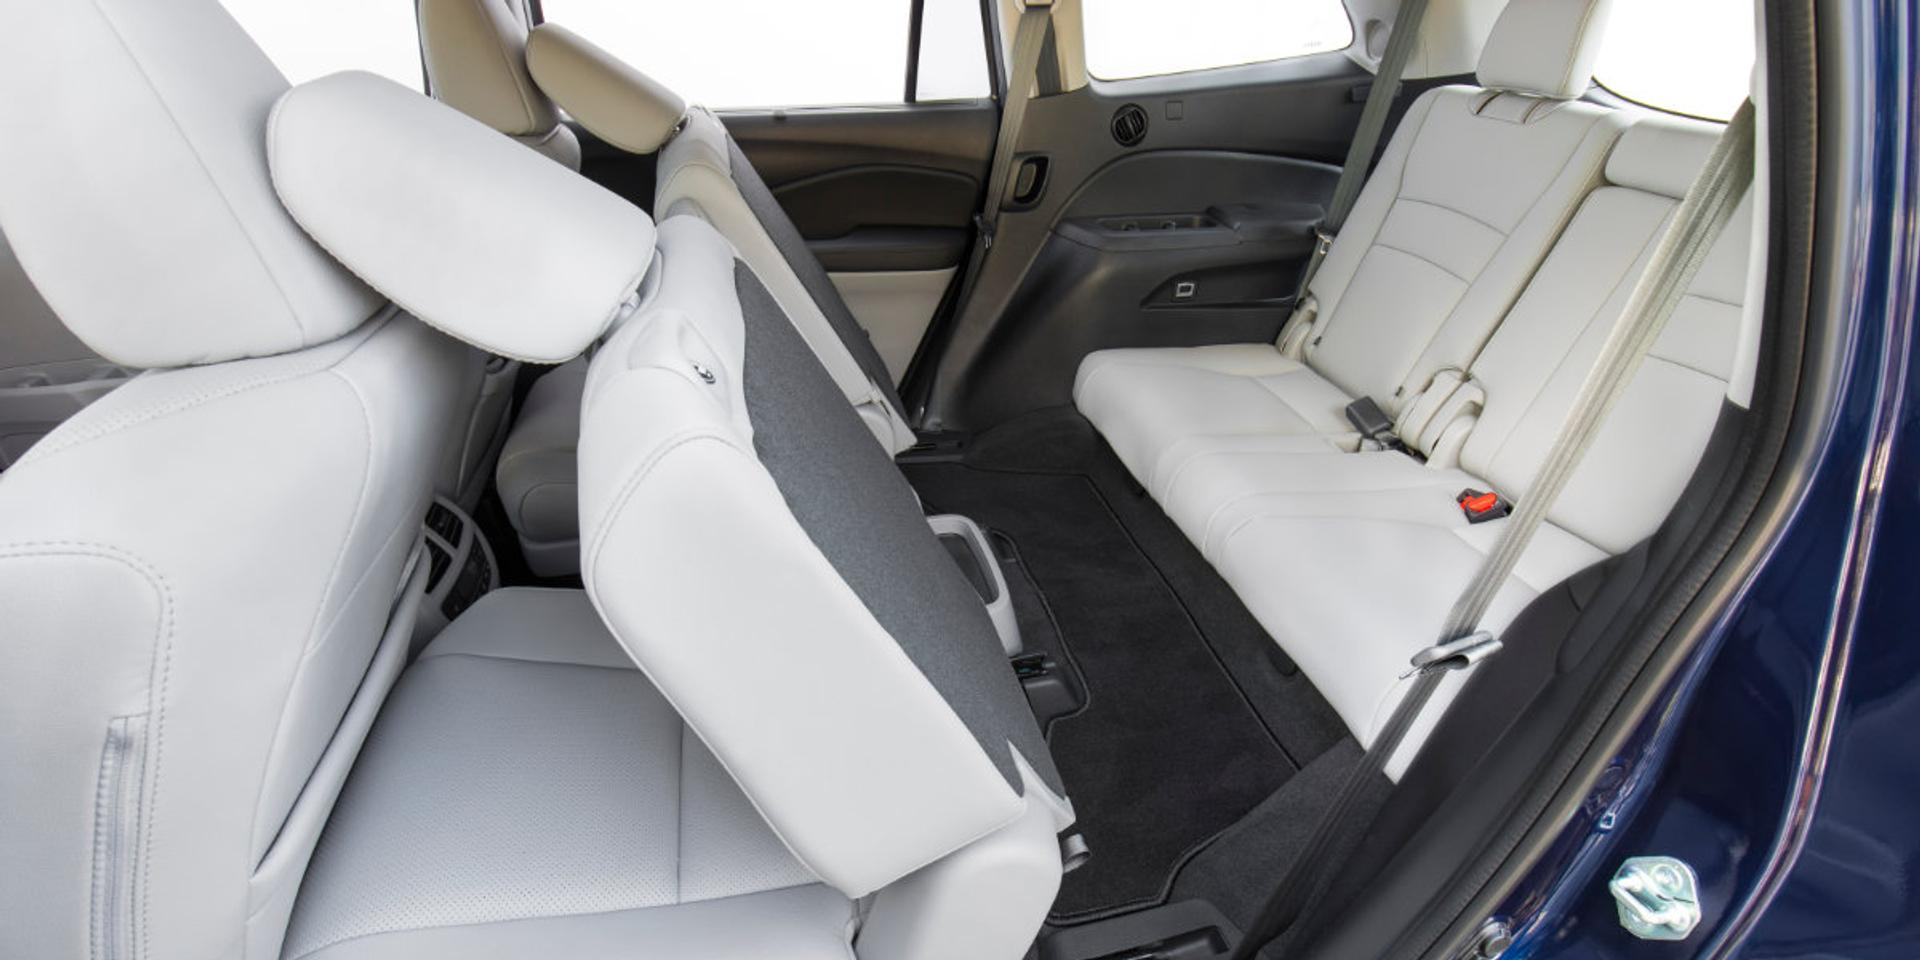 Honda Pilot rear passenger seating